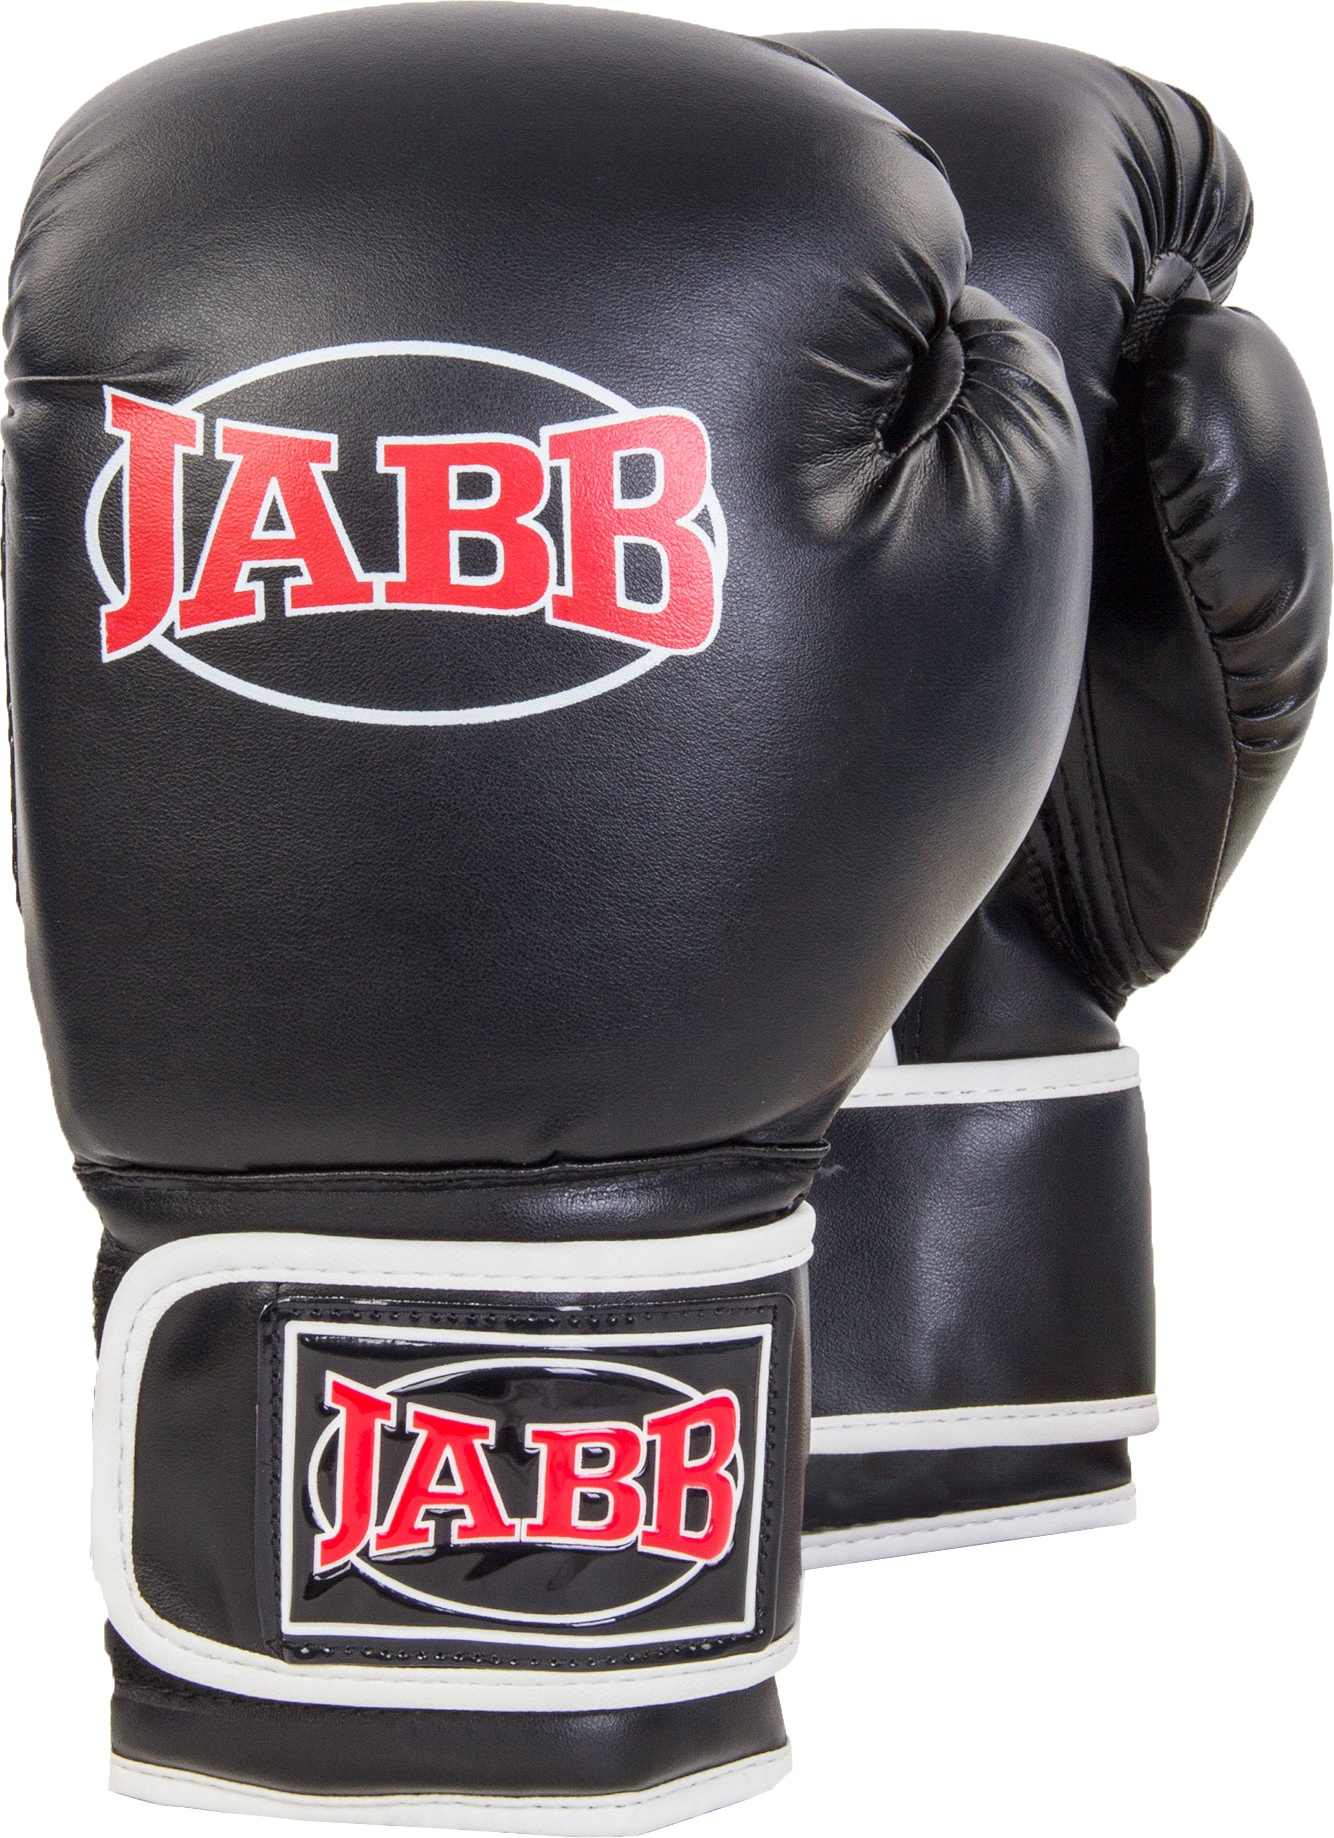 JABB JE-2010P